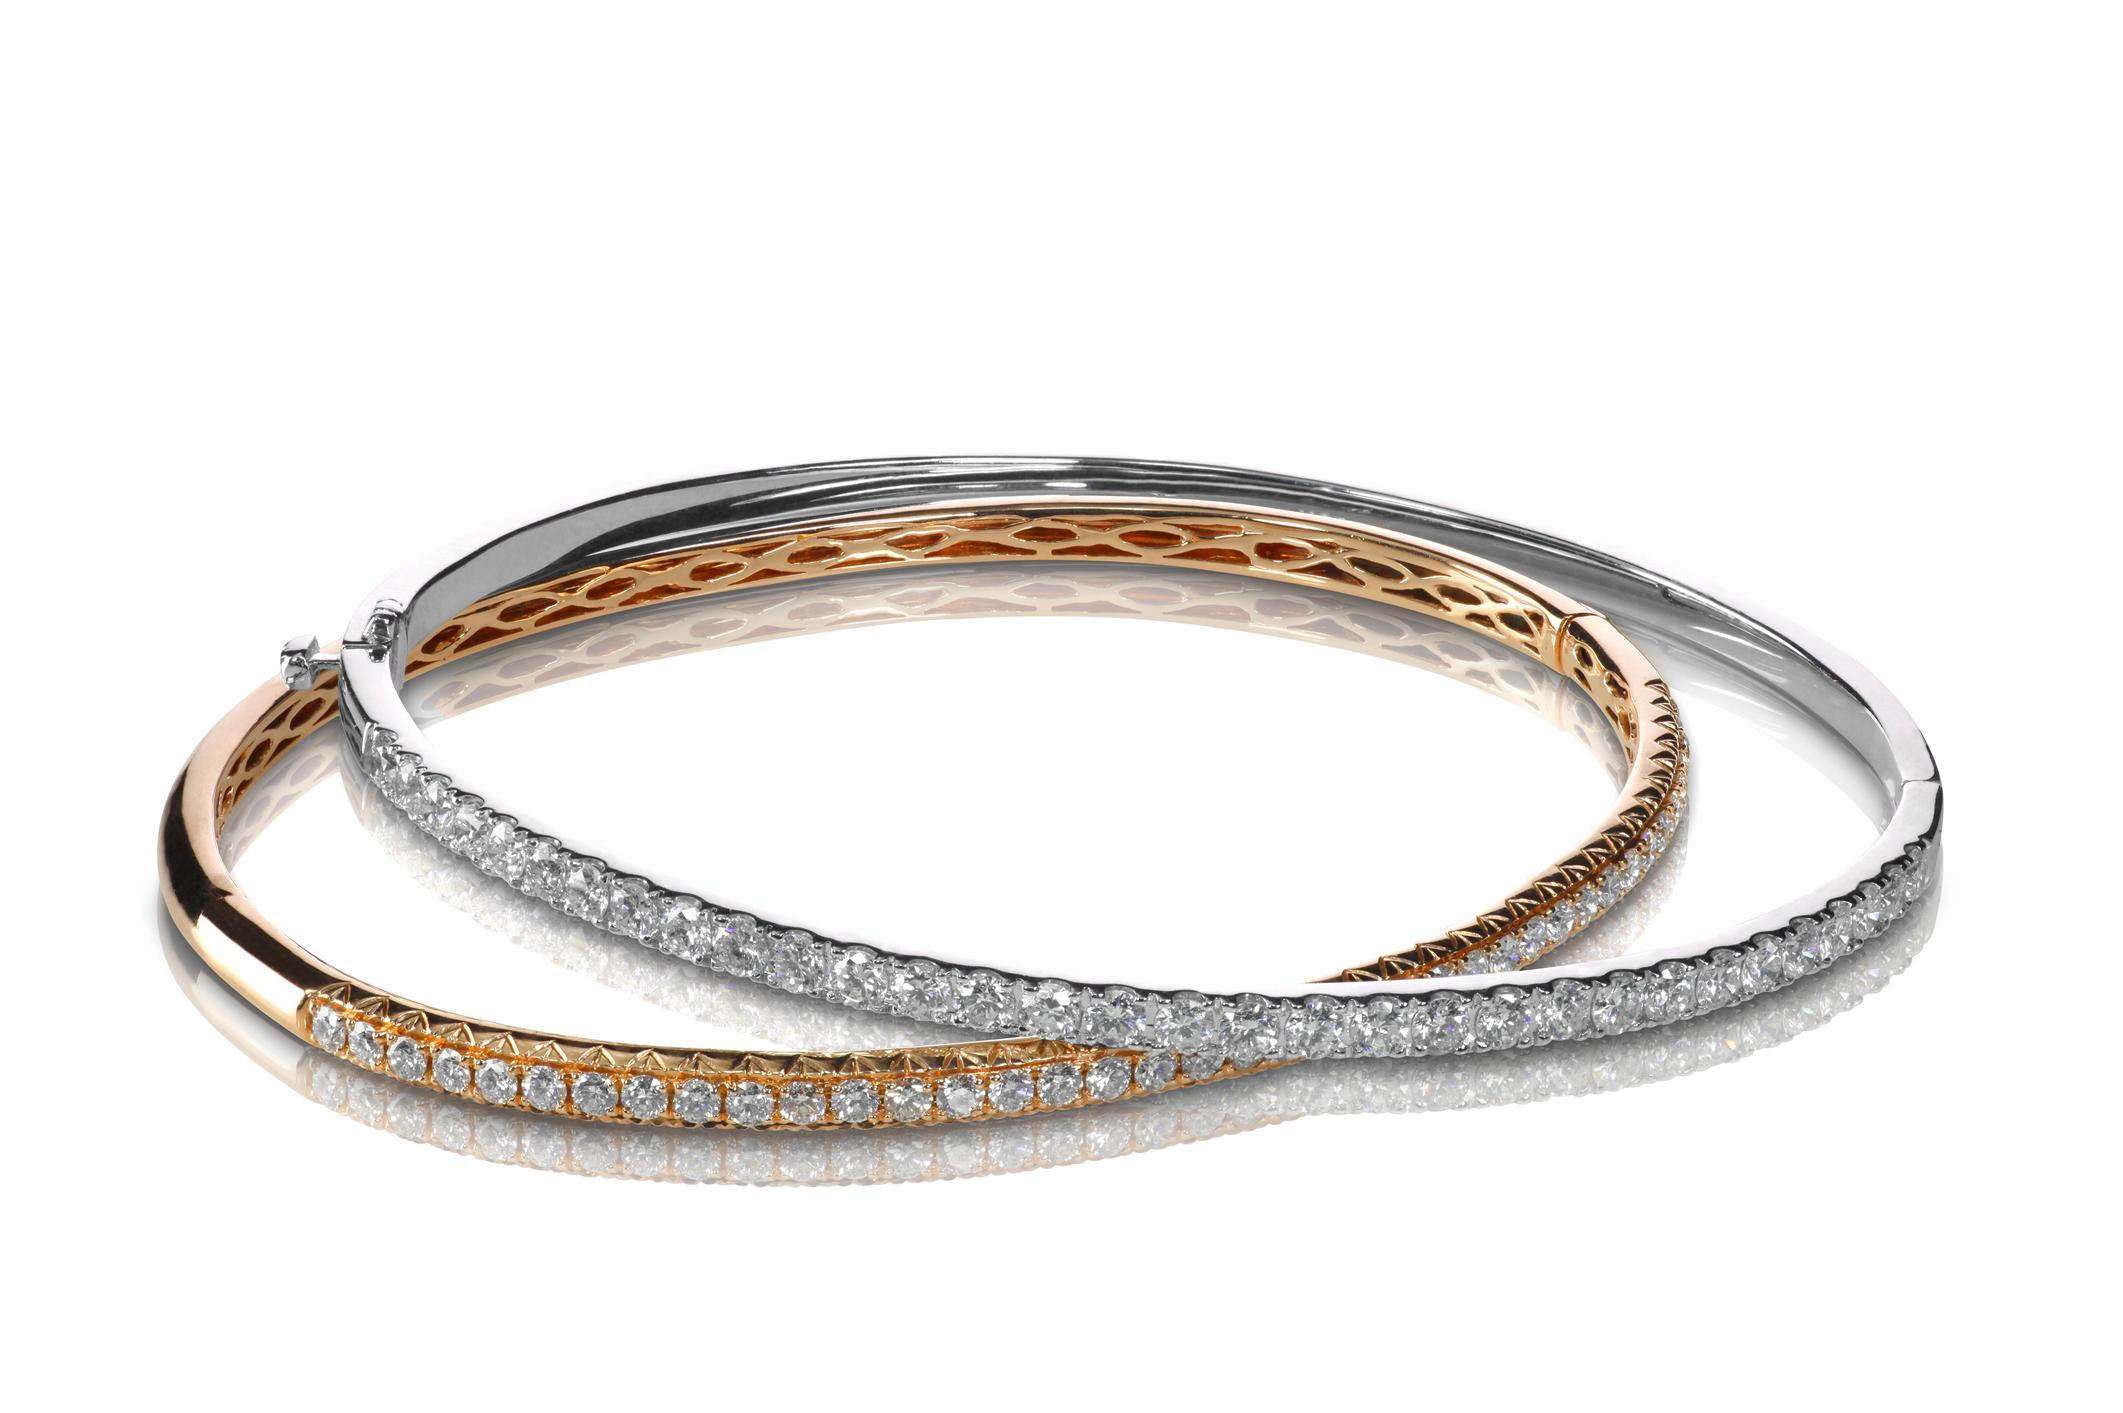 Diamond stackable Bangles and bracelets